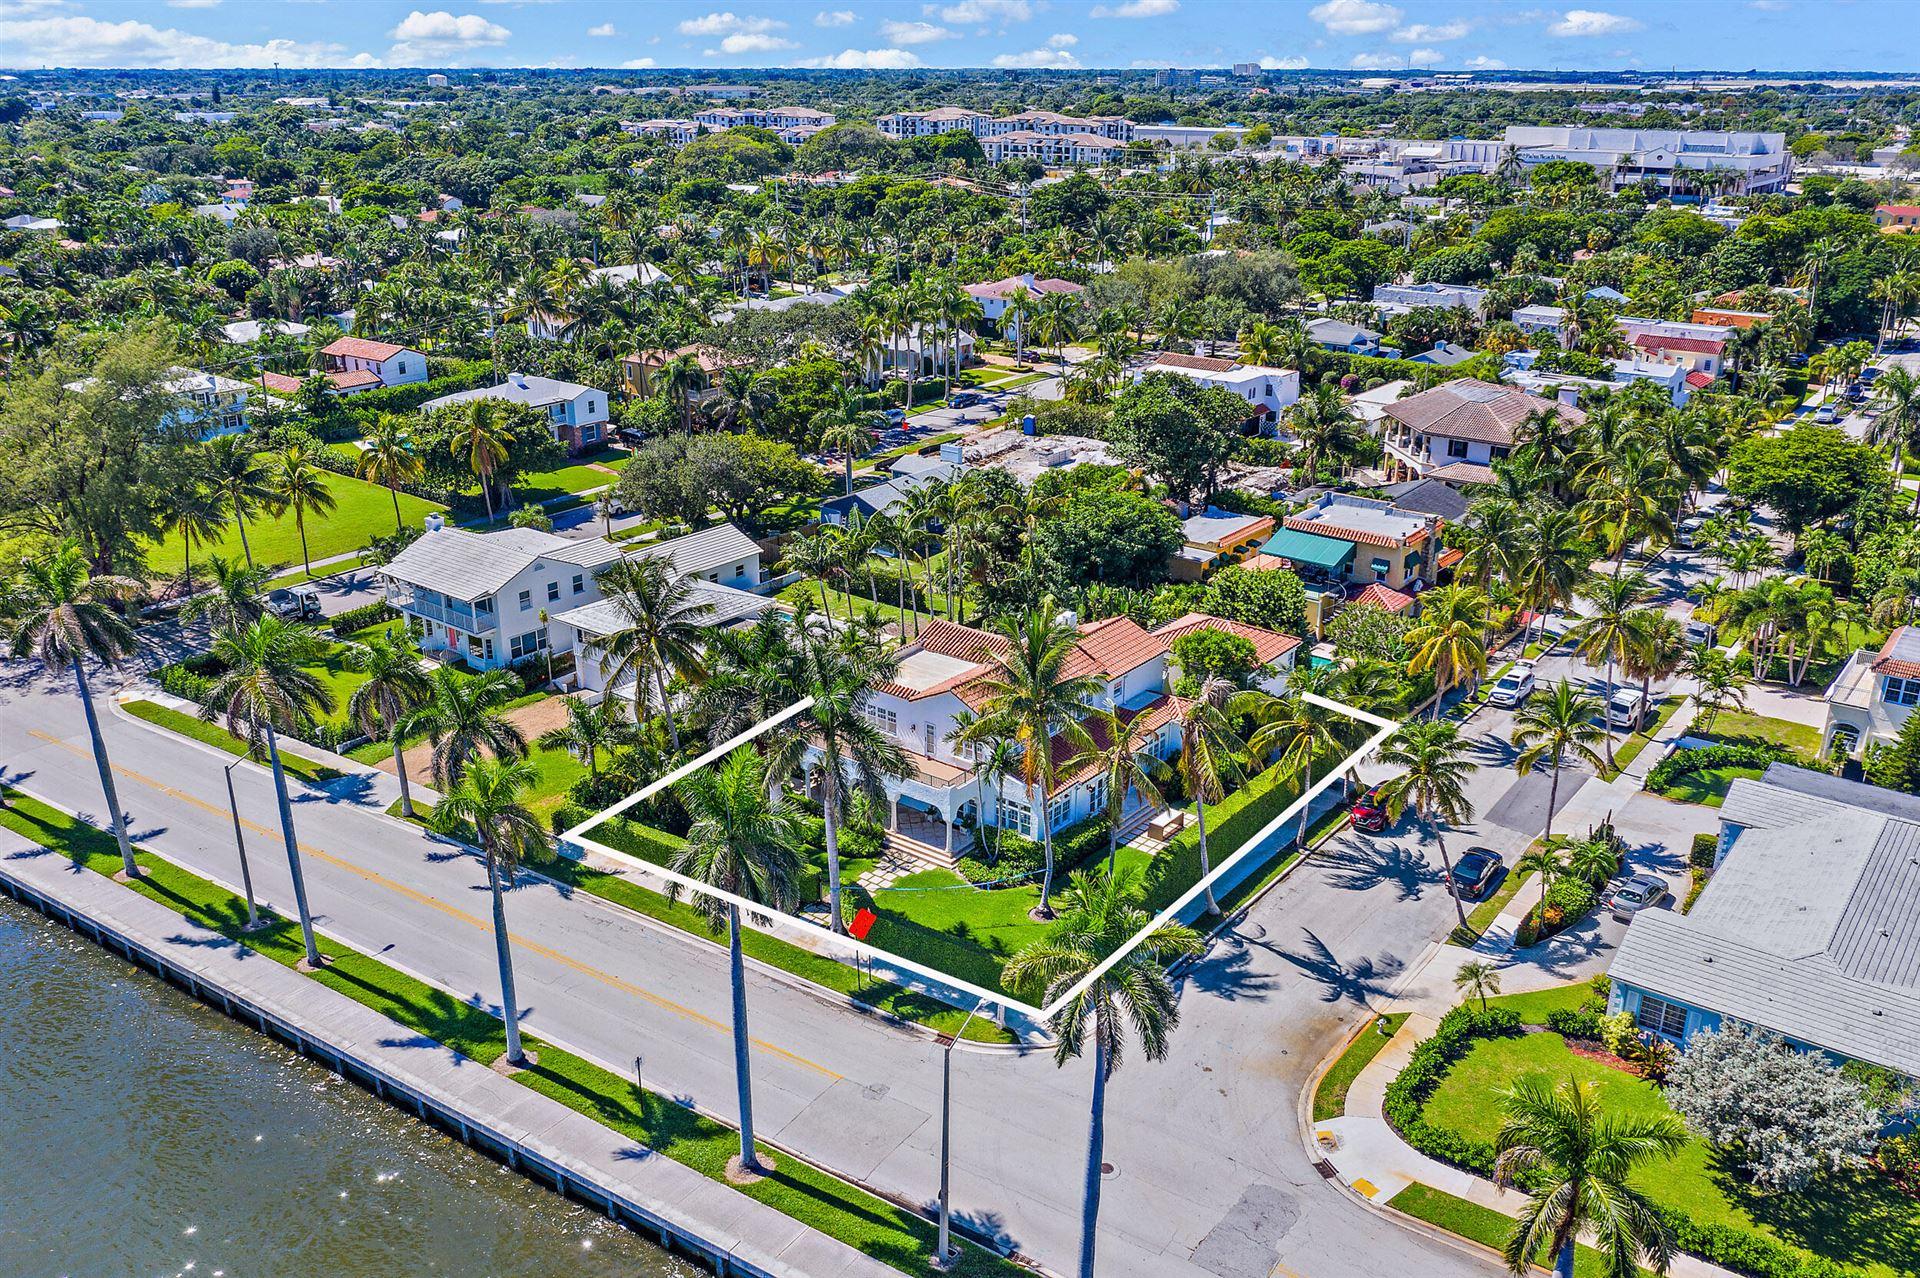 Photo of 2737 S Flagler Drive, West Palm Beach, FL 33405 (MLS # RX-10752514)